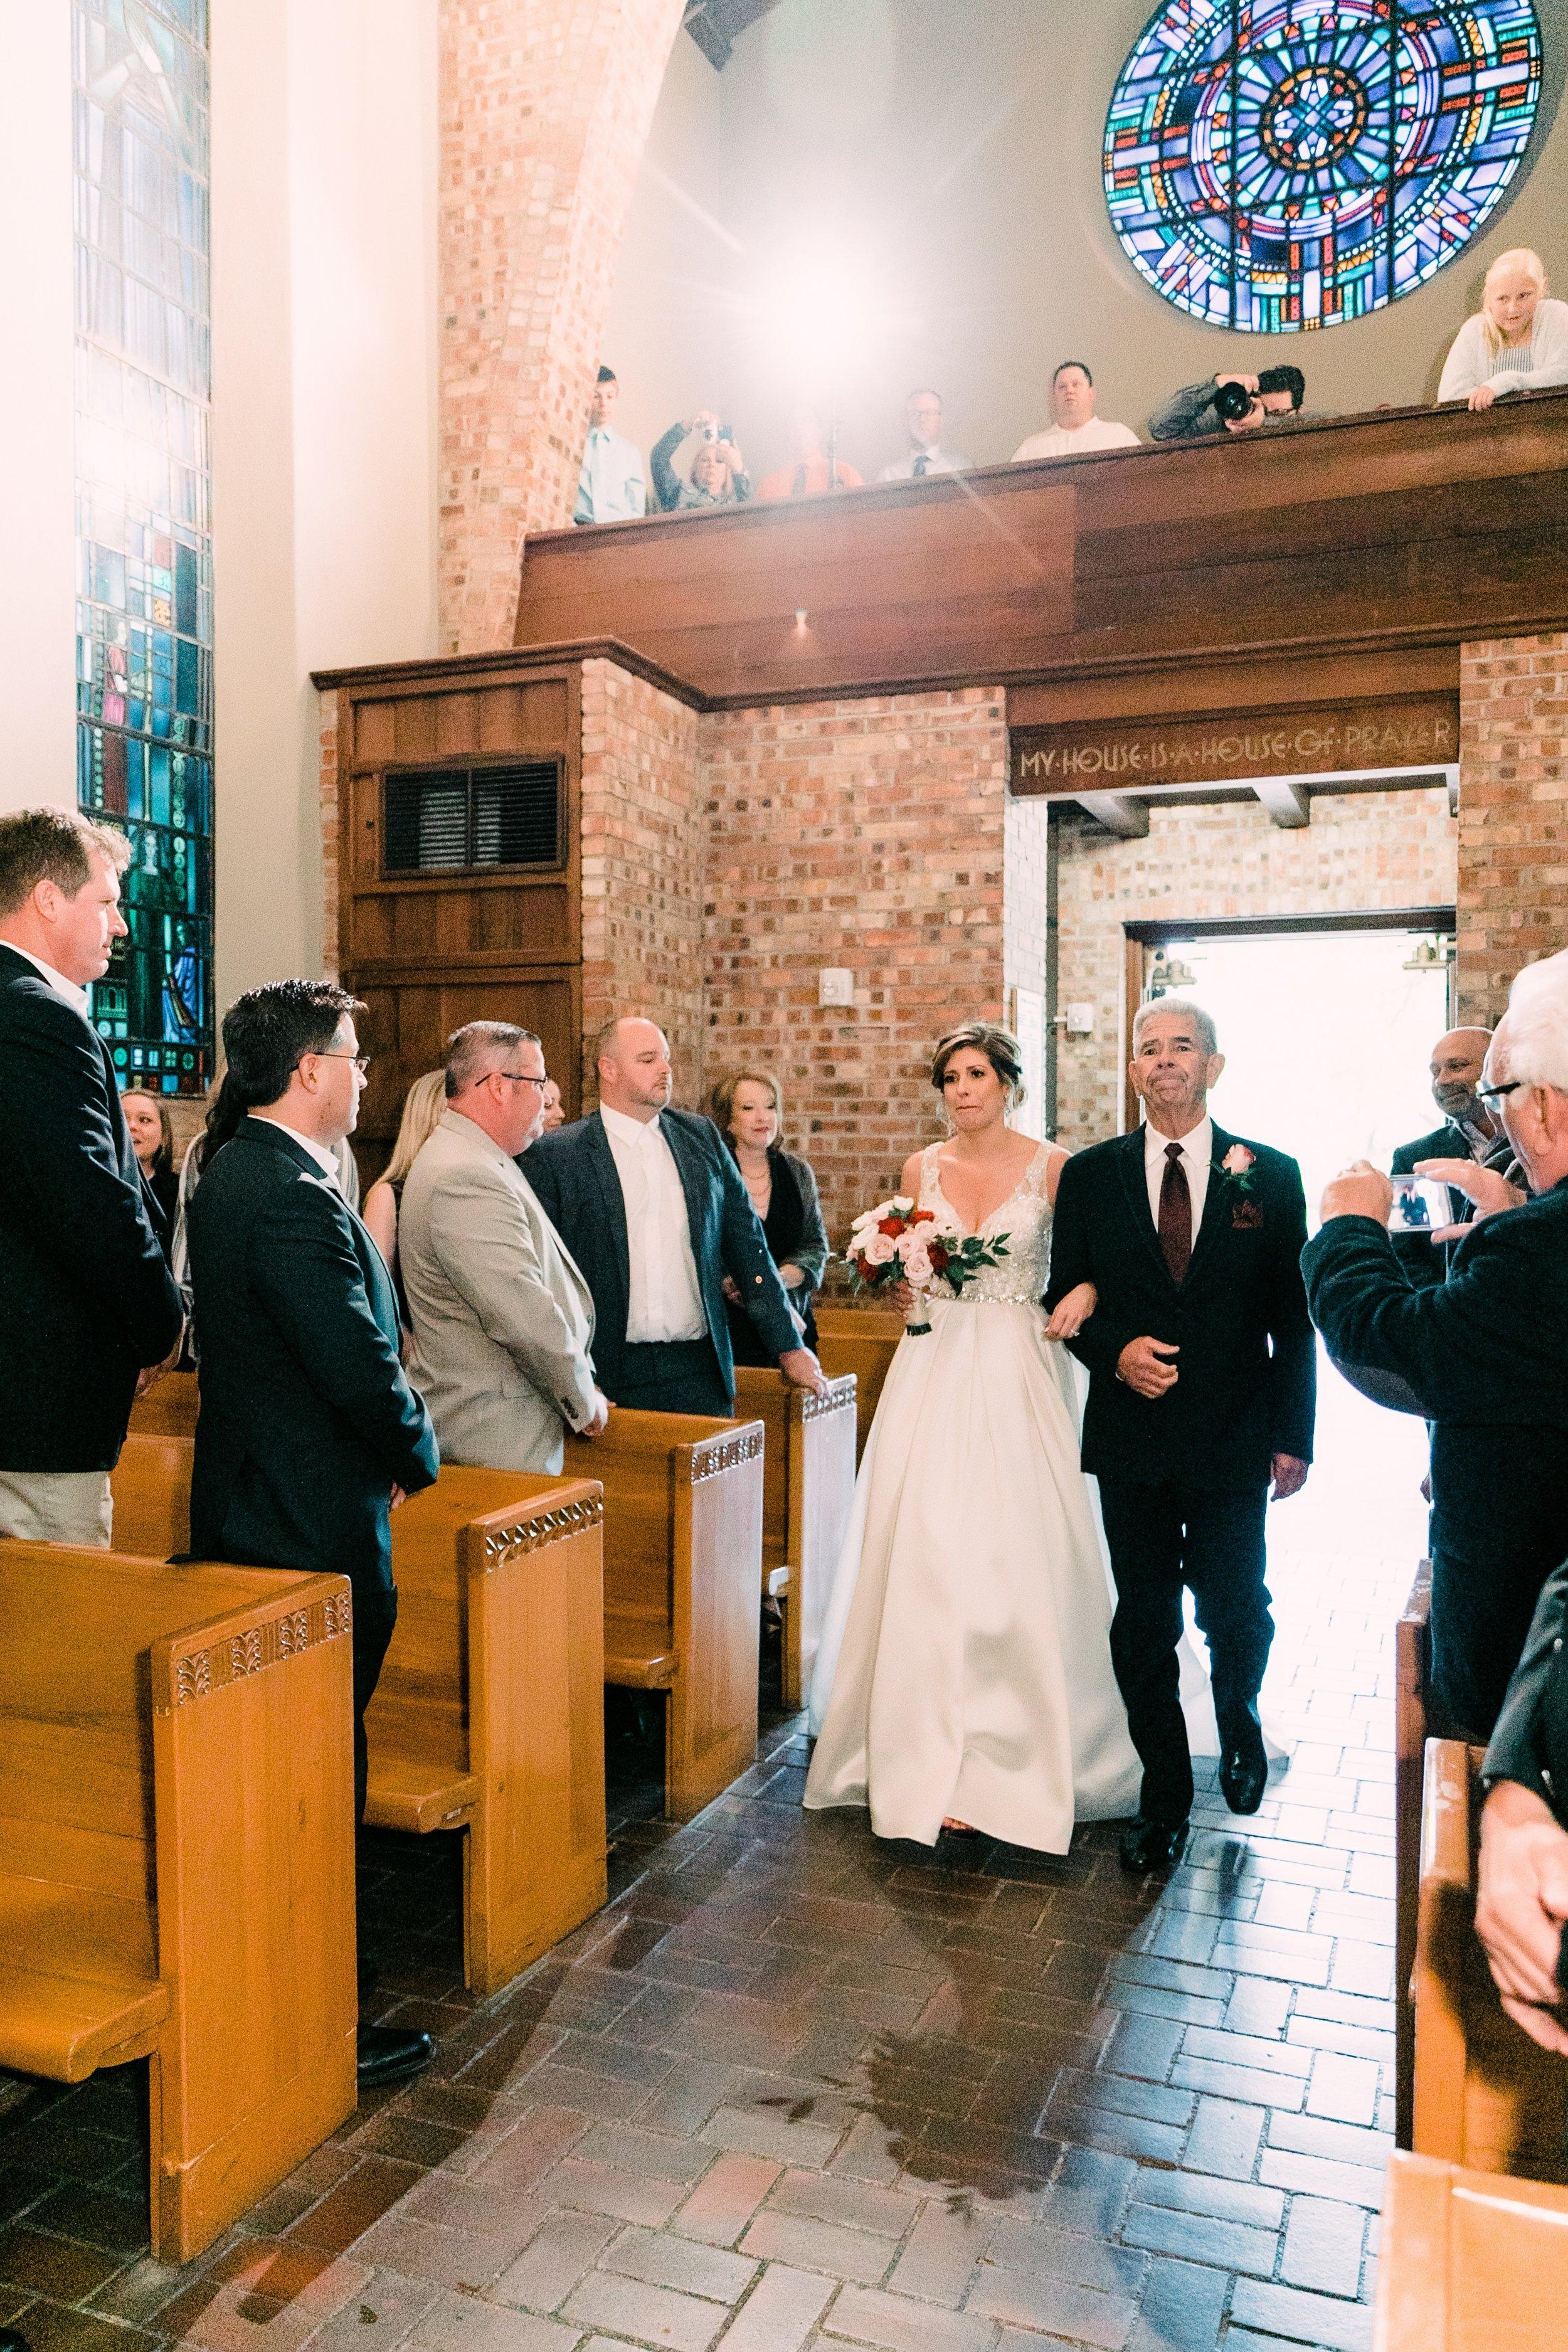 haehn-wedding-little-chapel-in-the-woods-denton-tx-lantana-golf-club-wedding-033.jpg